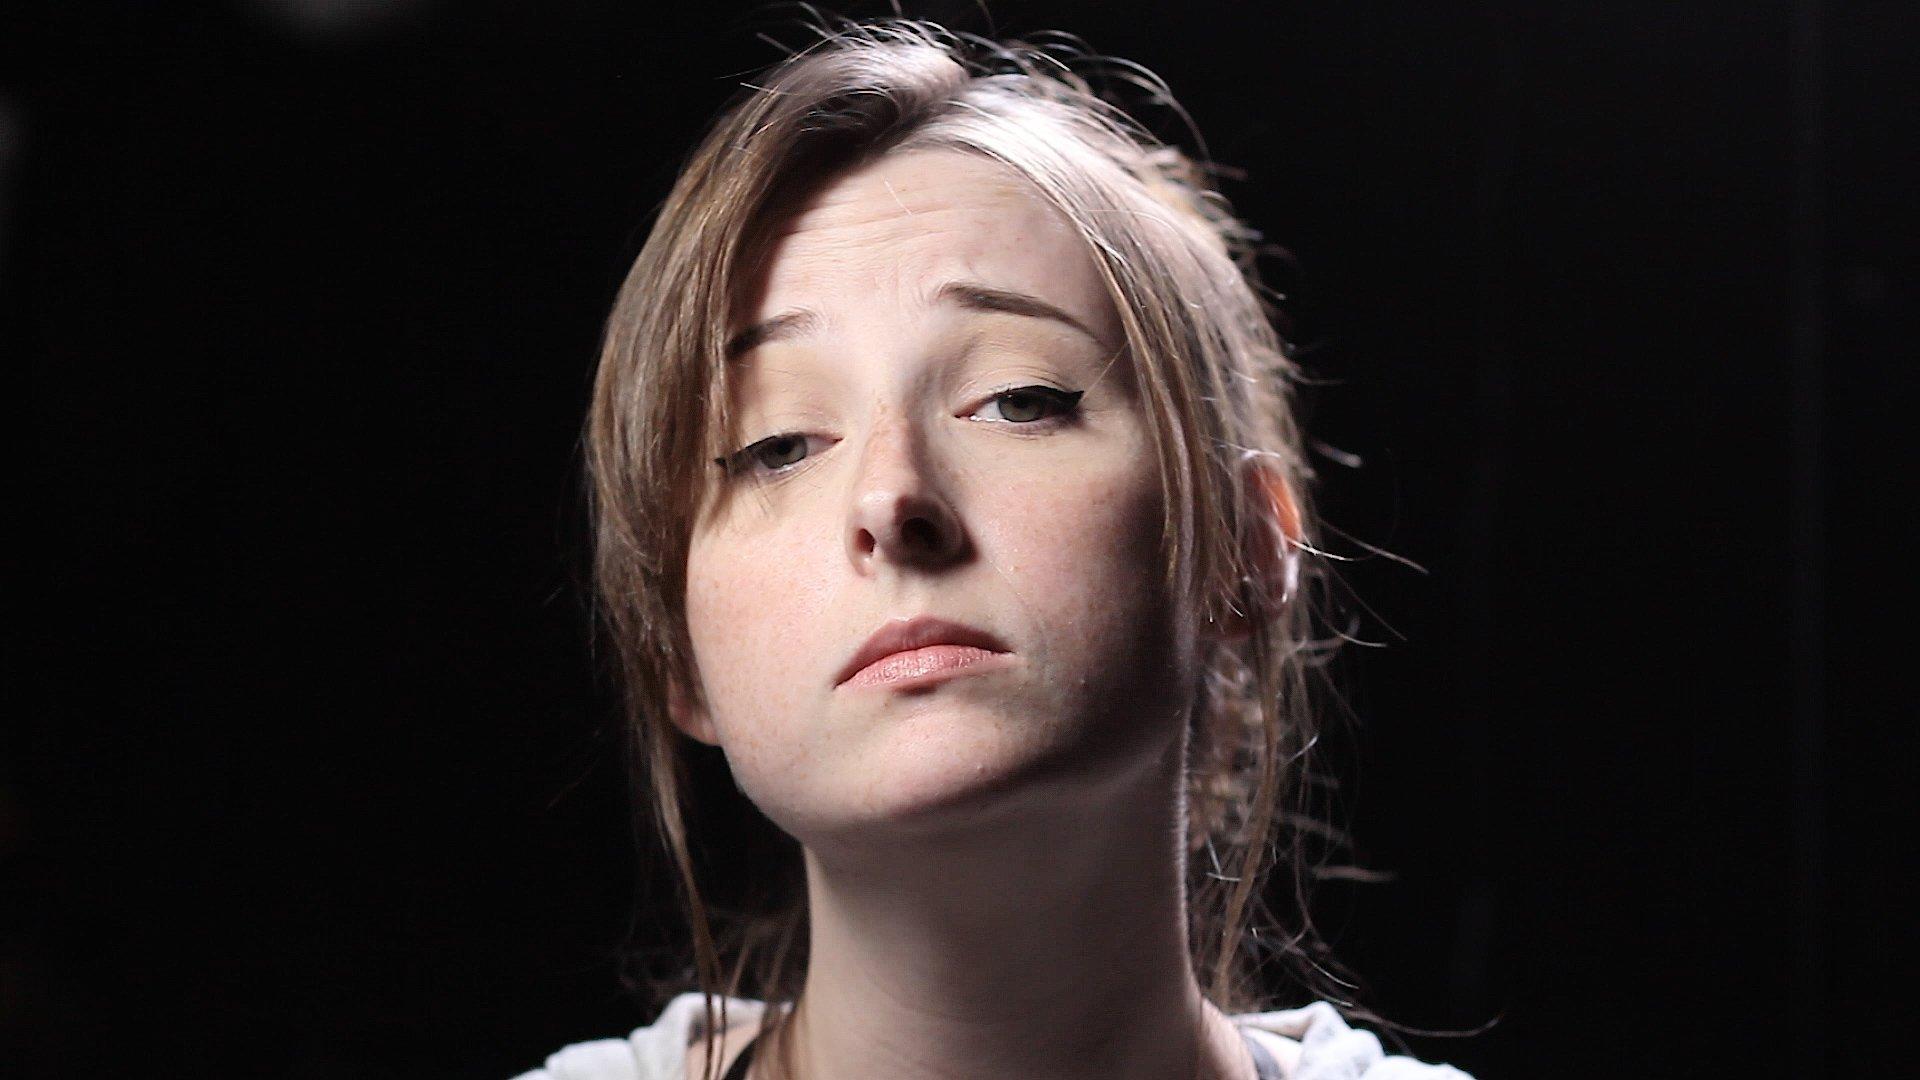 Tessa Violet Widescreen